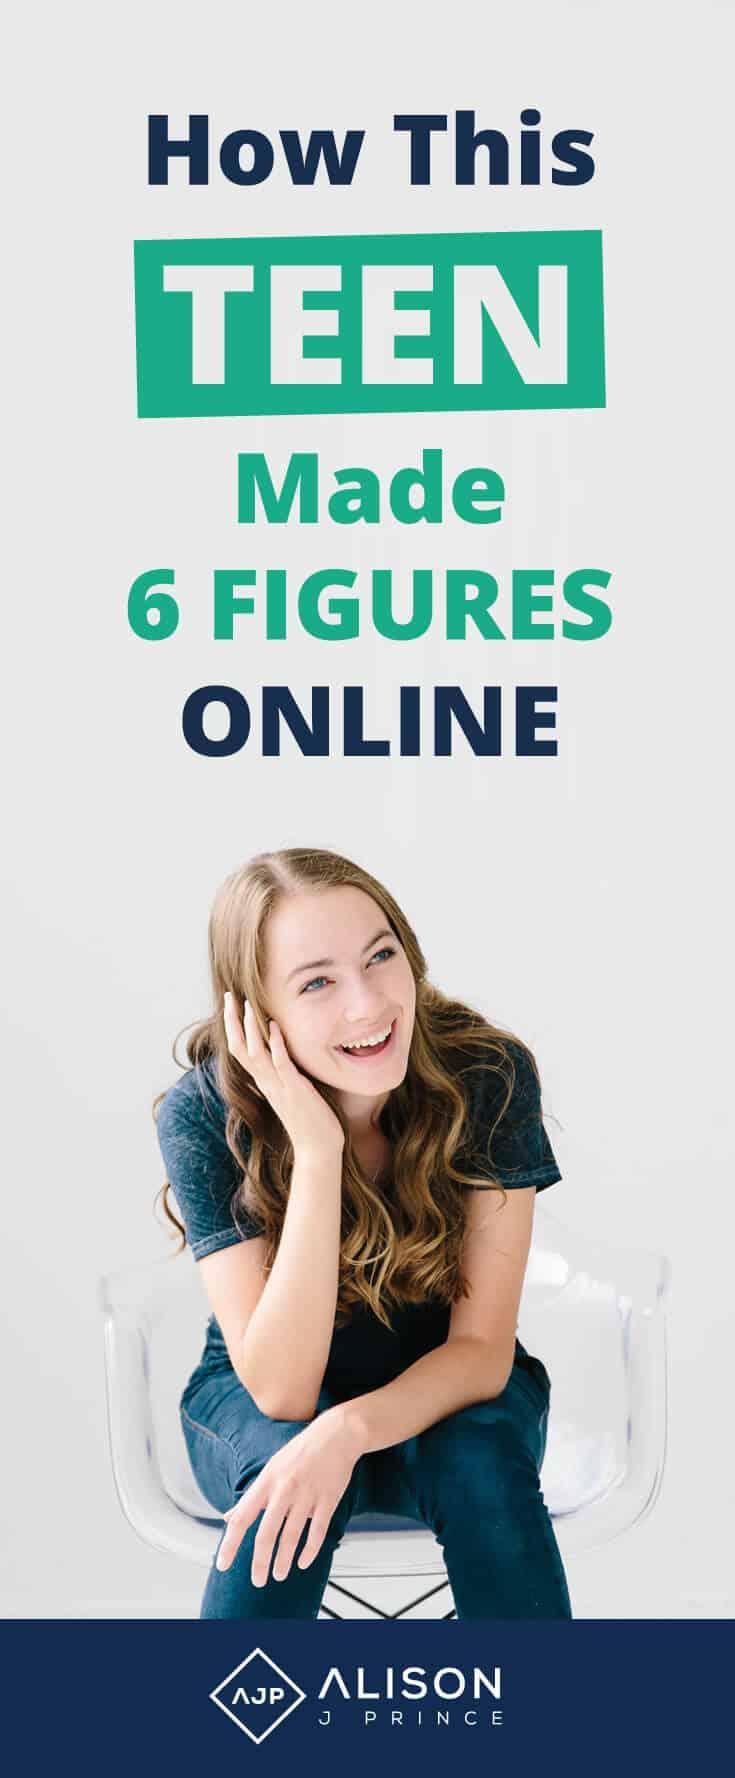 Teen Entrepreneur - Online 6 Figure Business - Alison J. Prince